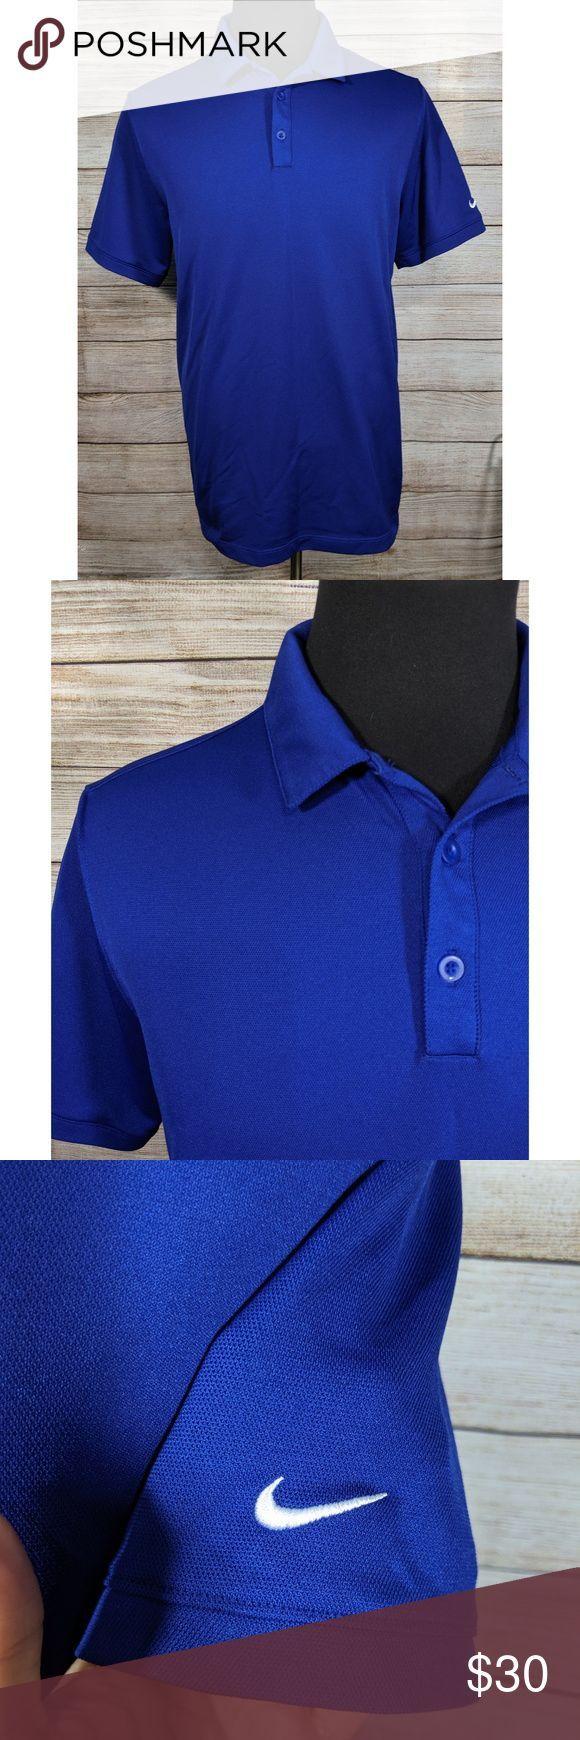 Nike Dri Fit Golf Tour Blue Athletic Polo Shirt XL Nike Dri Fit ...